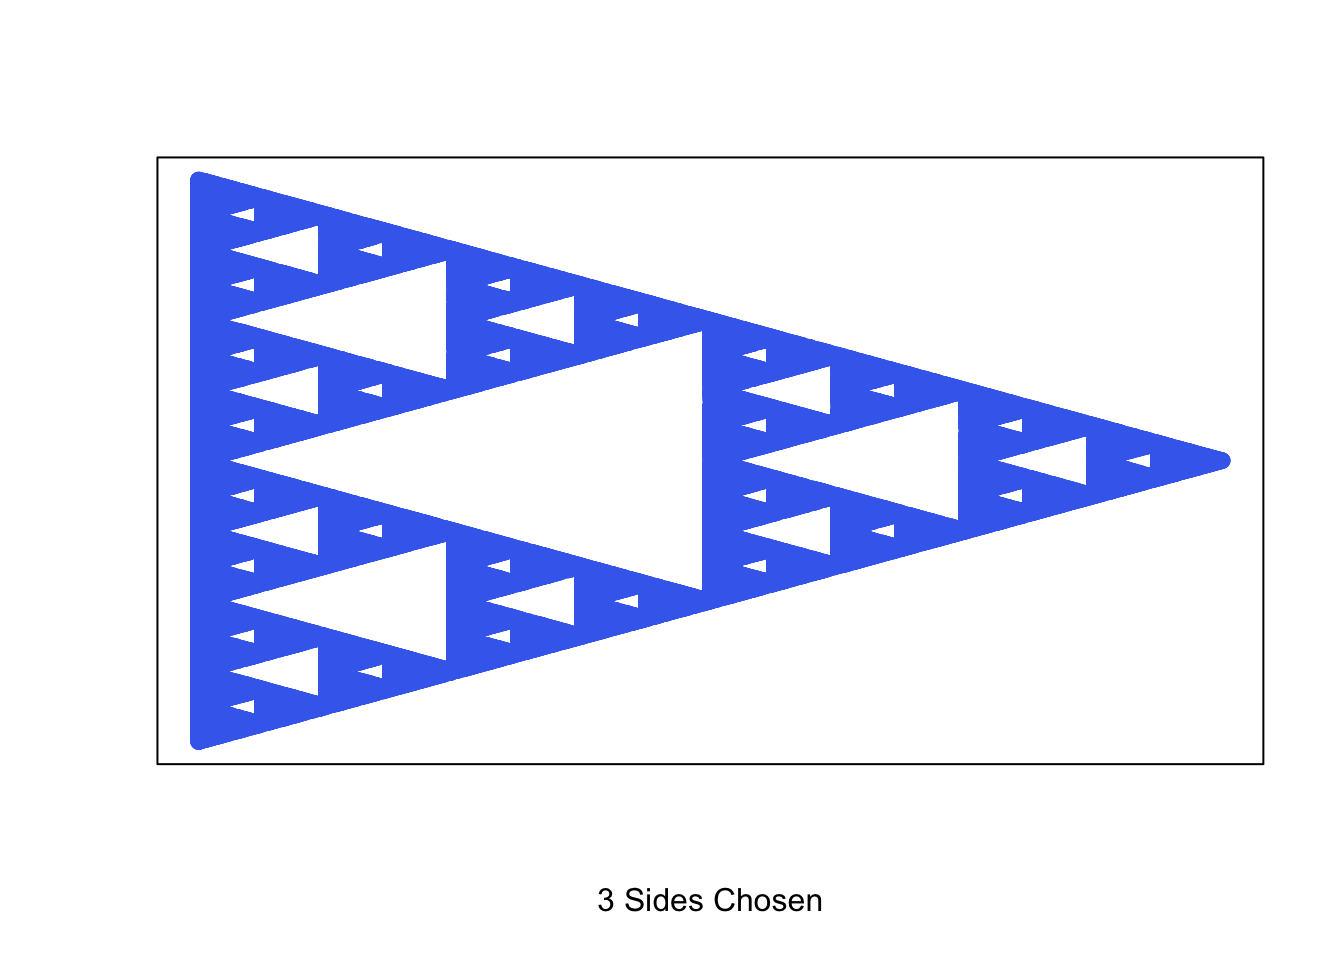 recursive shape fractal generator